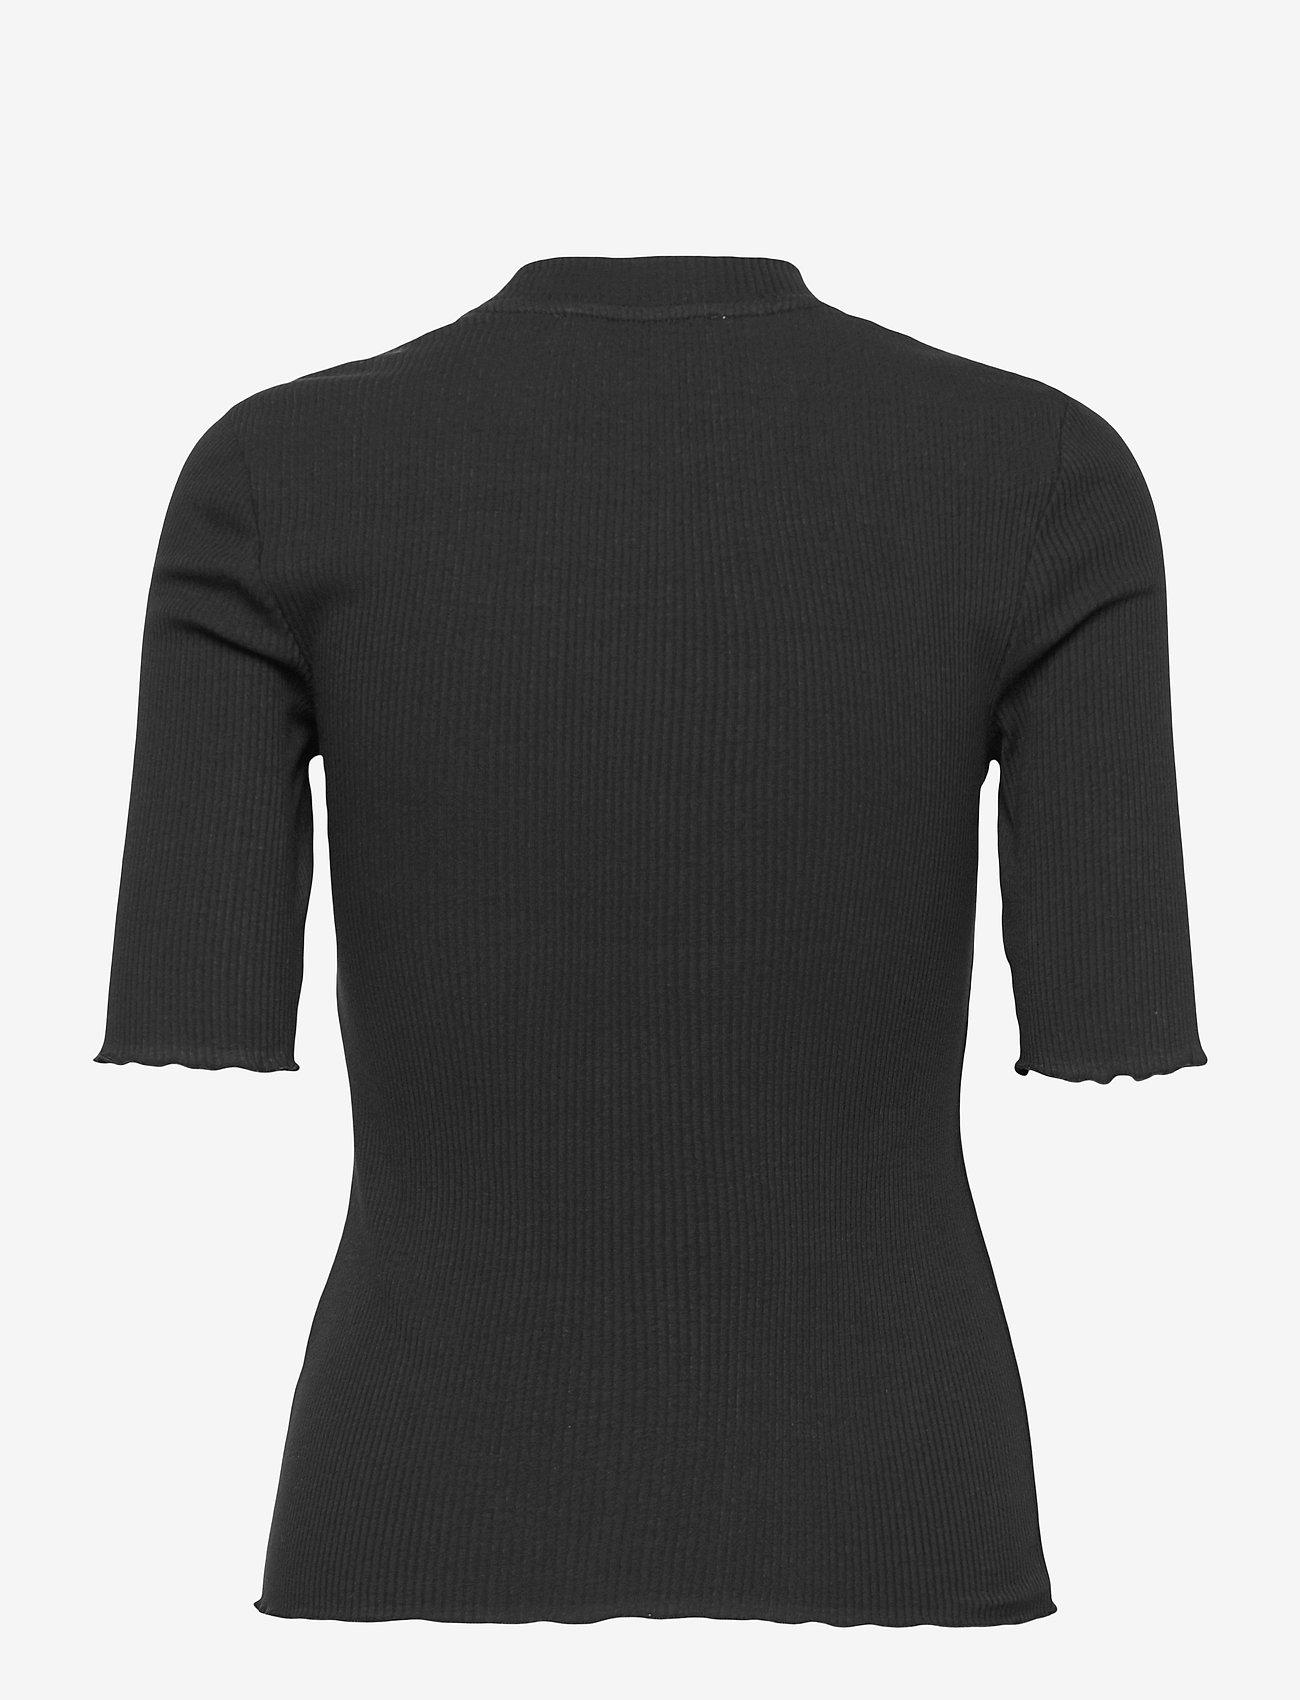 Selected Femme - SLFANNA 2/4 CREW NECK TEE S NOOS - t-shirts - black - 1